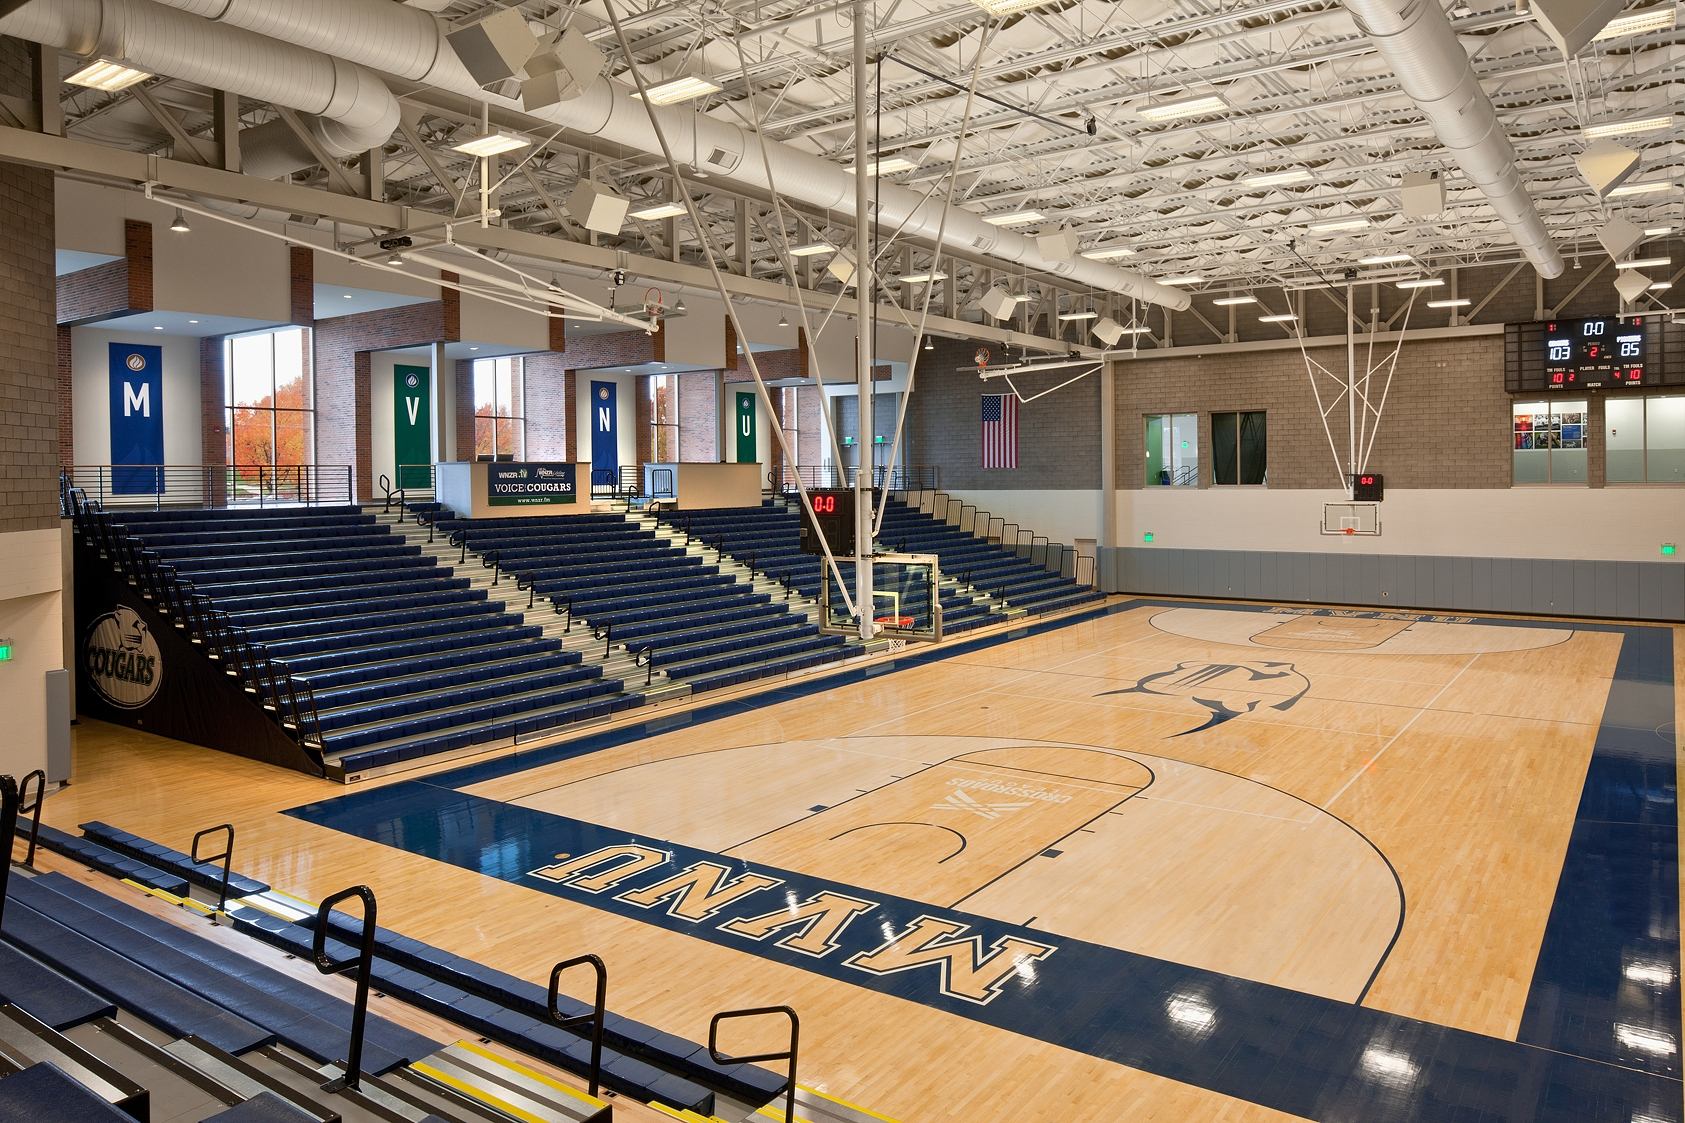 Mount Vernon Nazarene University Ariel Arena - Mt. Vernon, Ohio